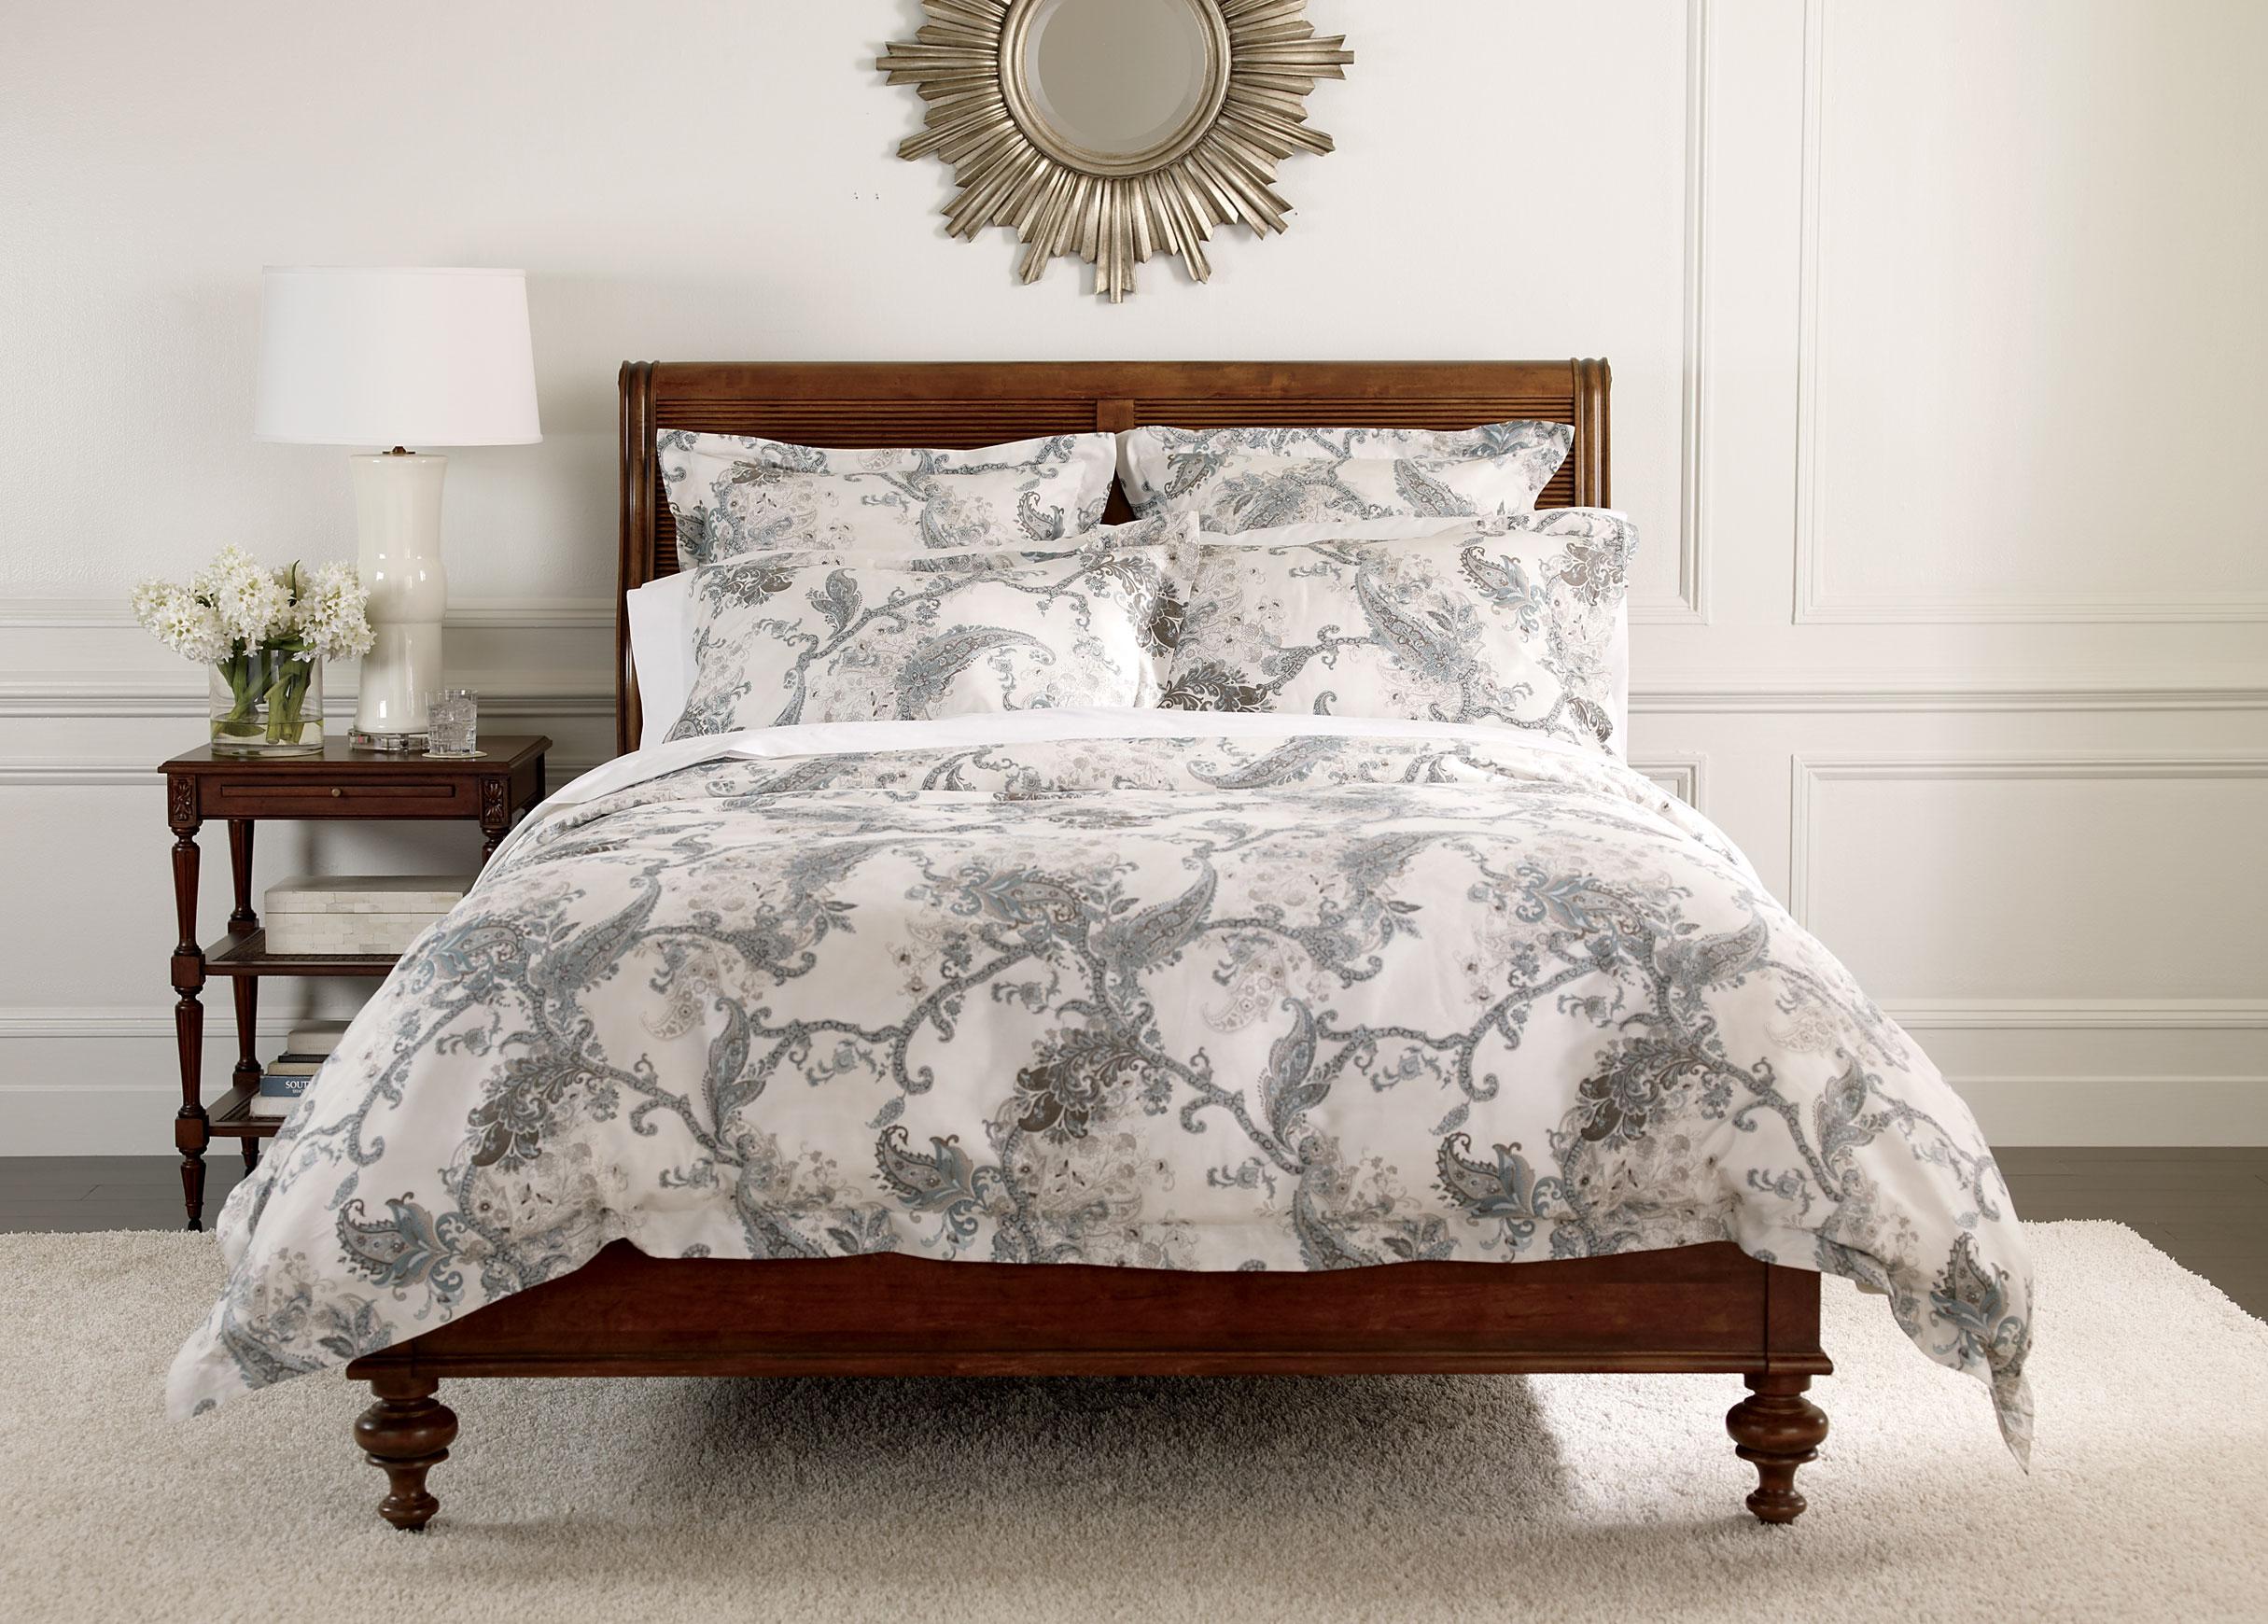 us catalog full duvet s queen en pillowcase ikea and cover vass products ofelia comforter double